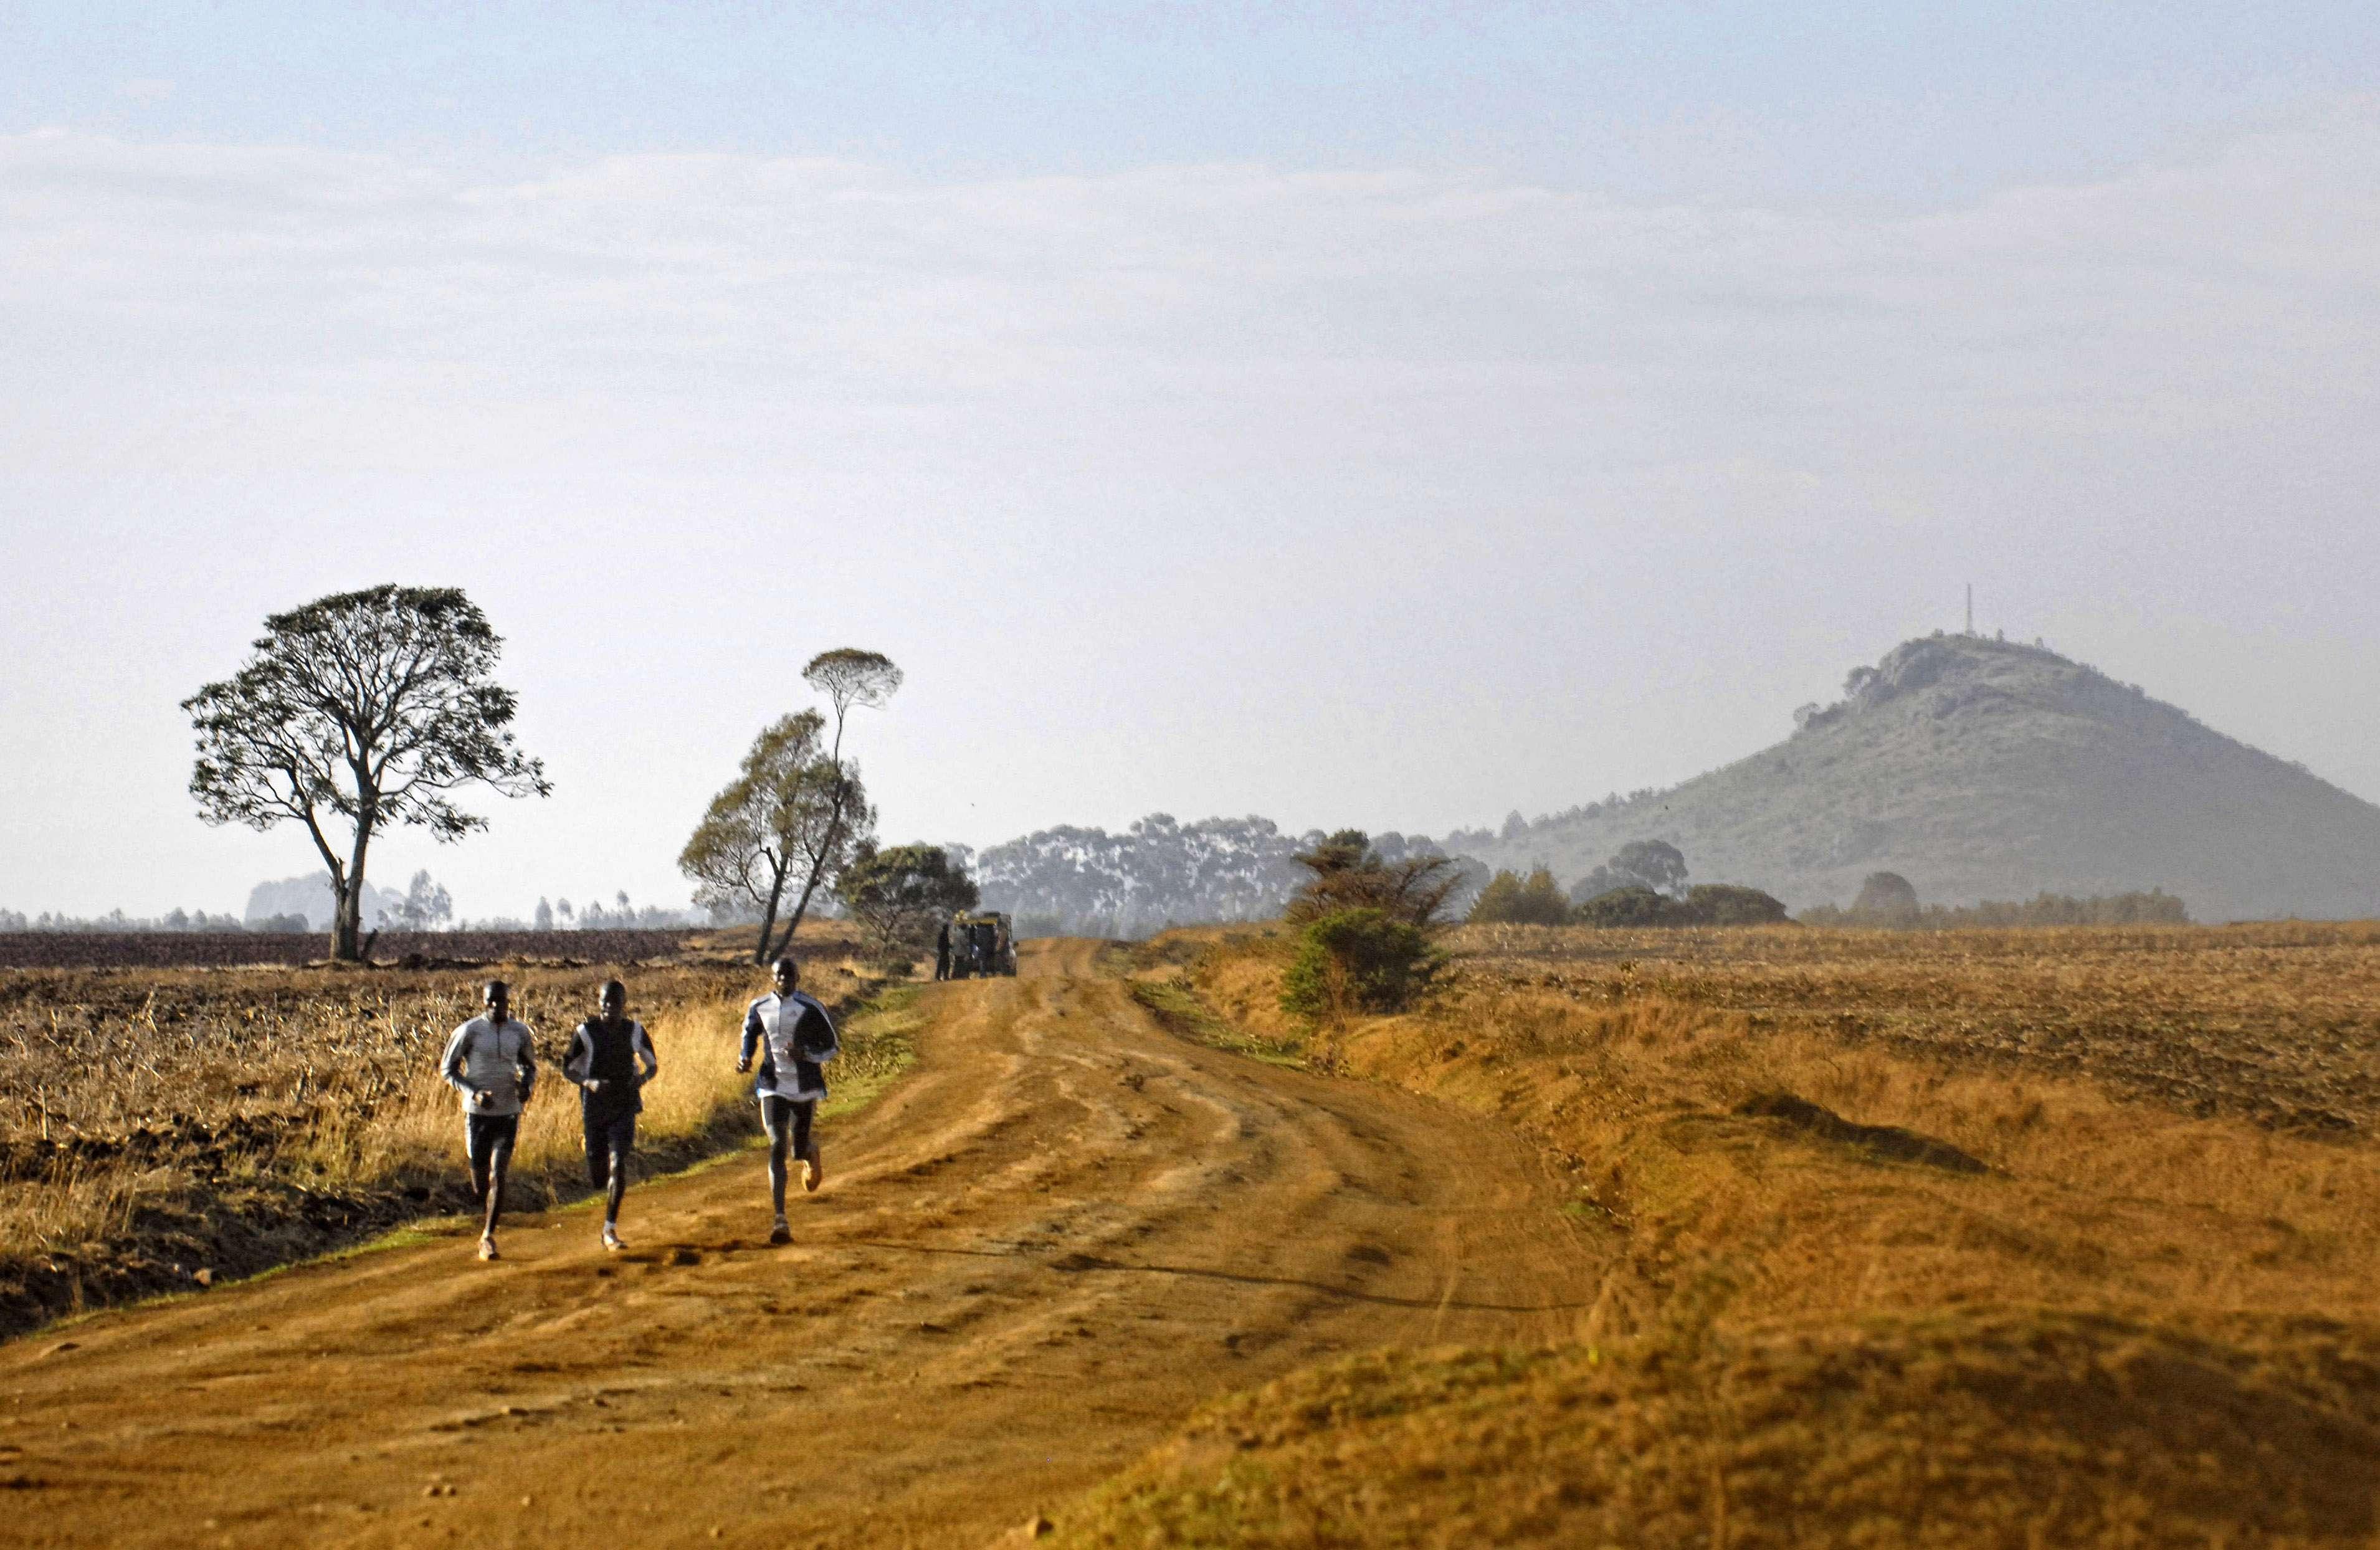 Vežbaj da trčiš brže: Kako da se ubrzam i popravim vreme na polumaratonu?